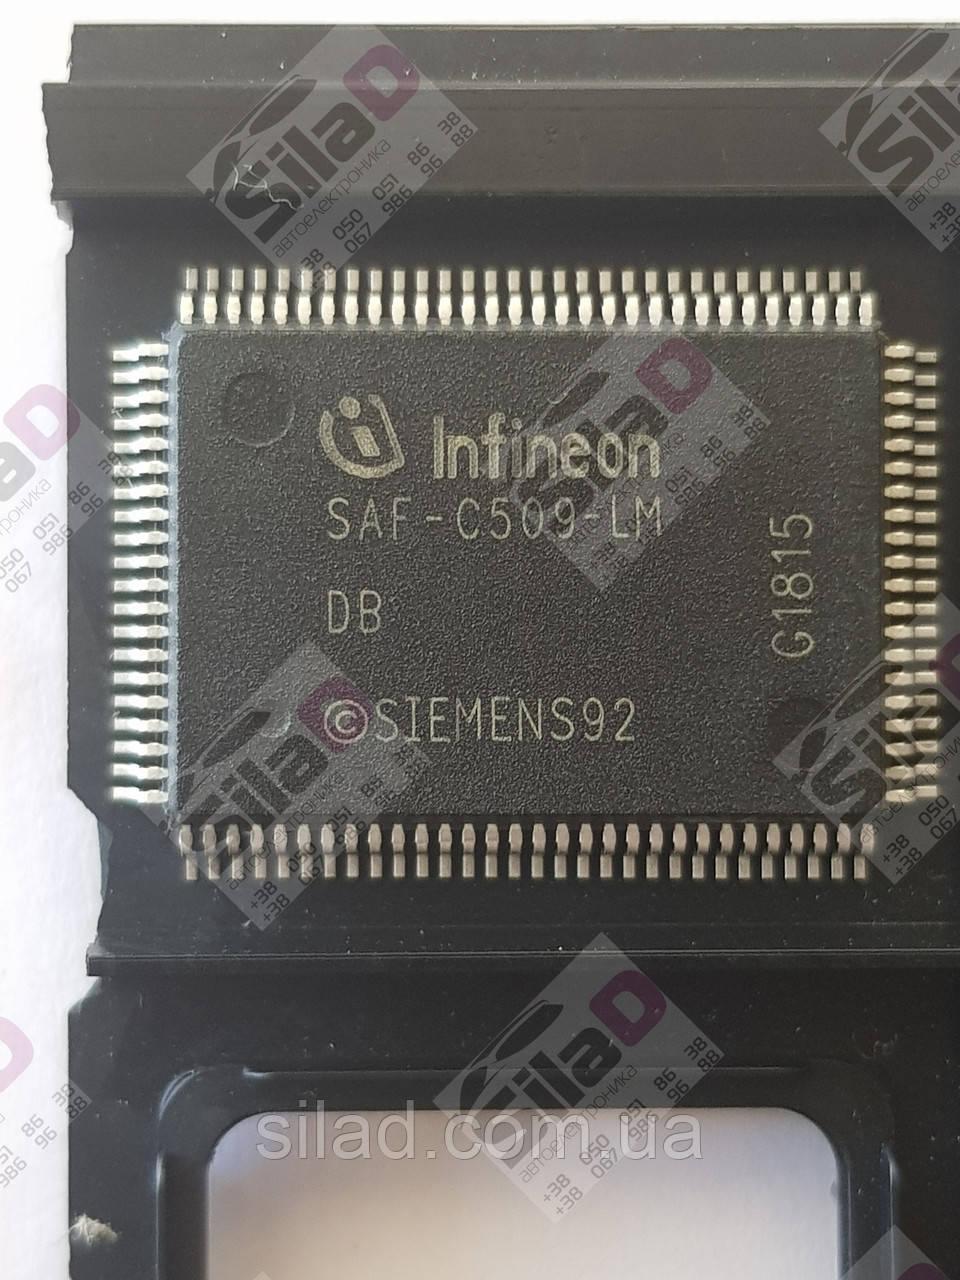 Мікроконтролер SAF-C509-LM Infineon корпус P-MQFP-100-2